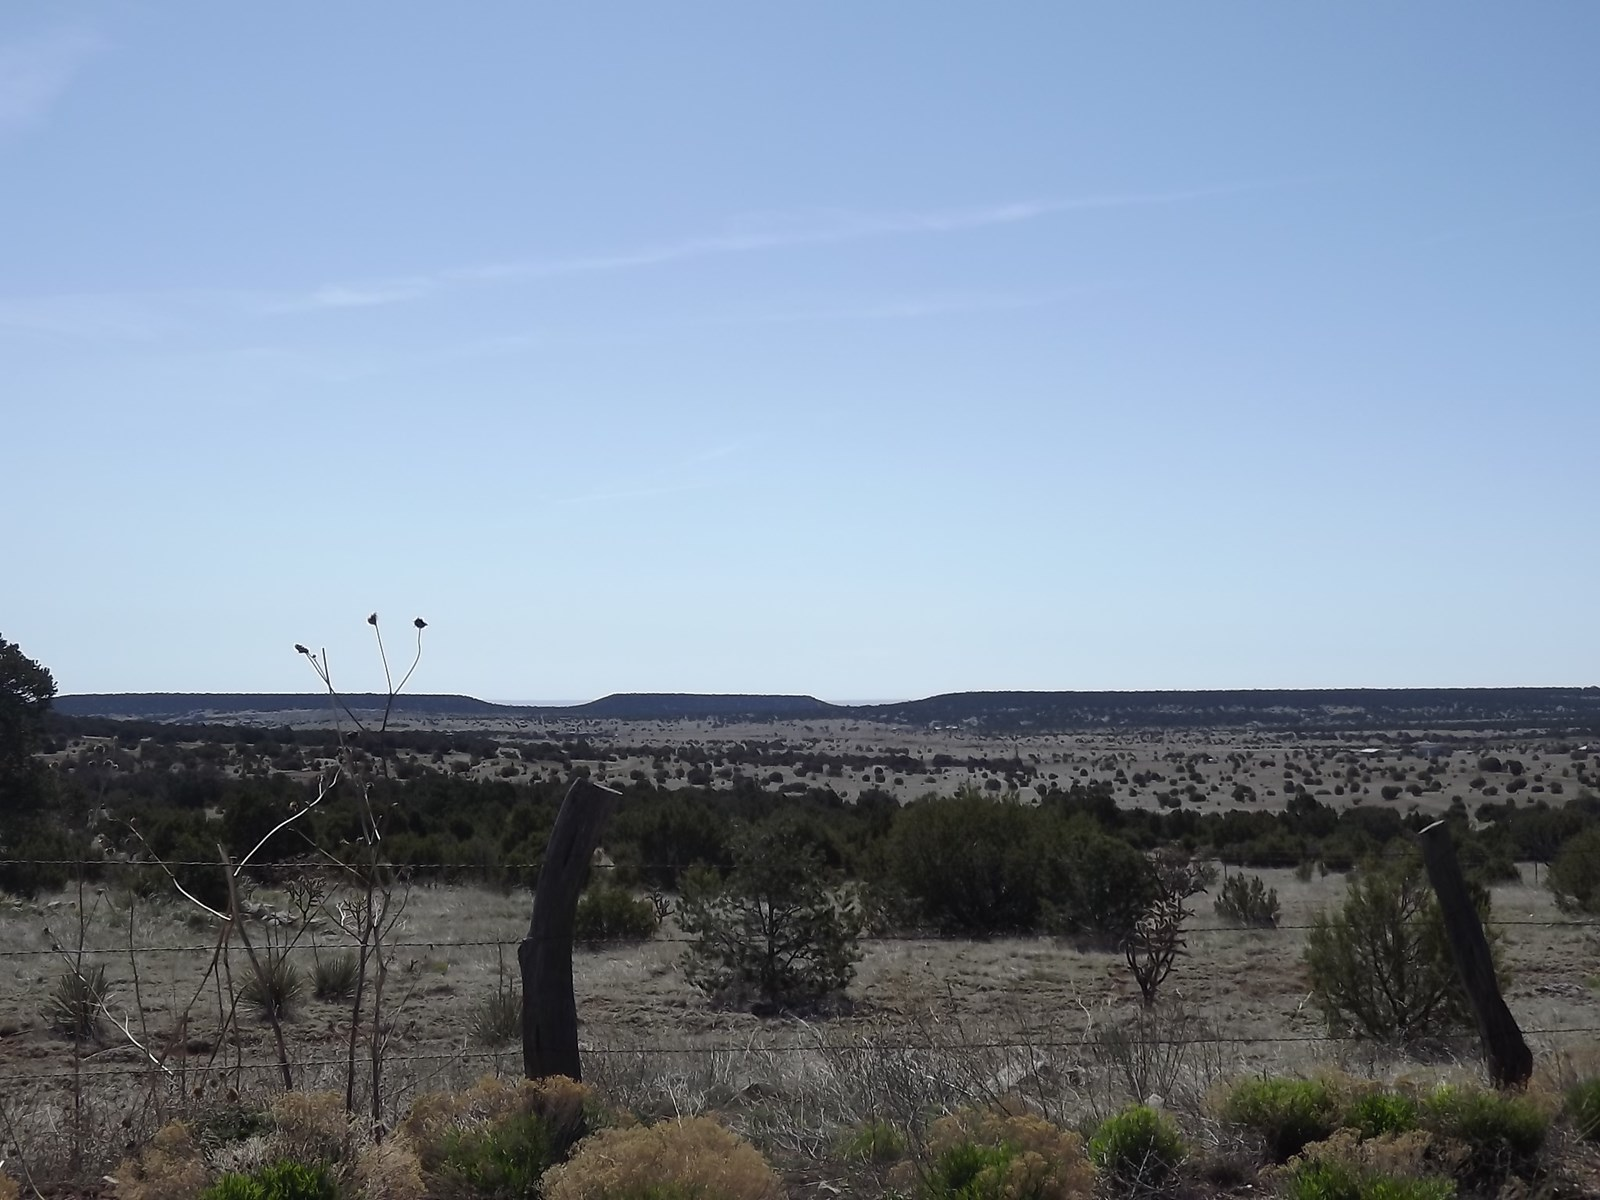 Manzano Mountain Land For Sale 50 Acres Near Tijeras NM